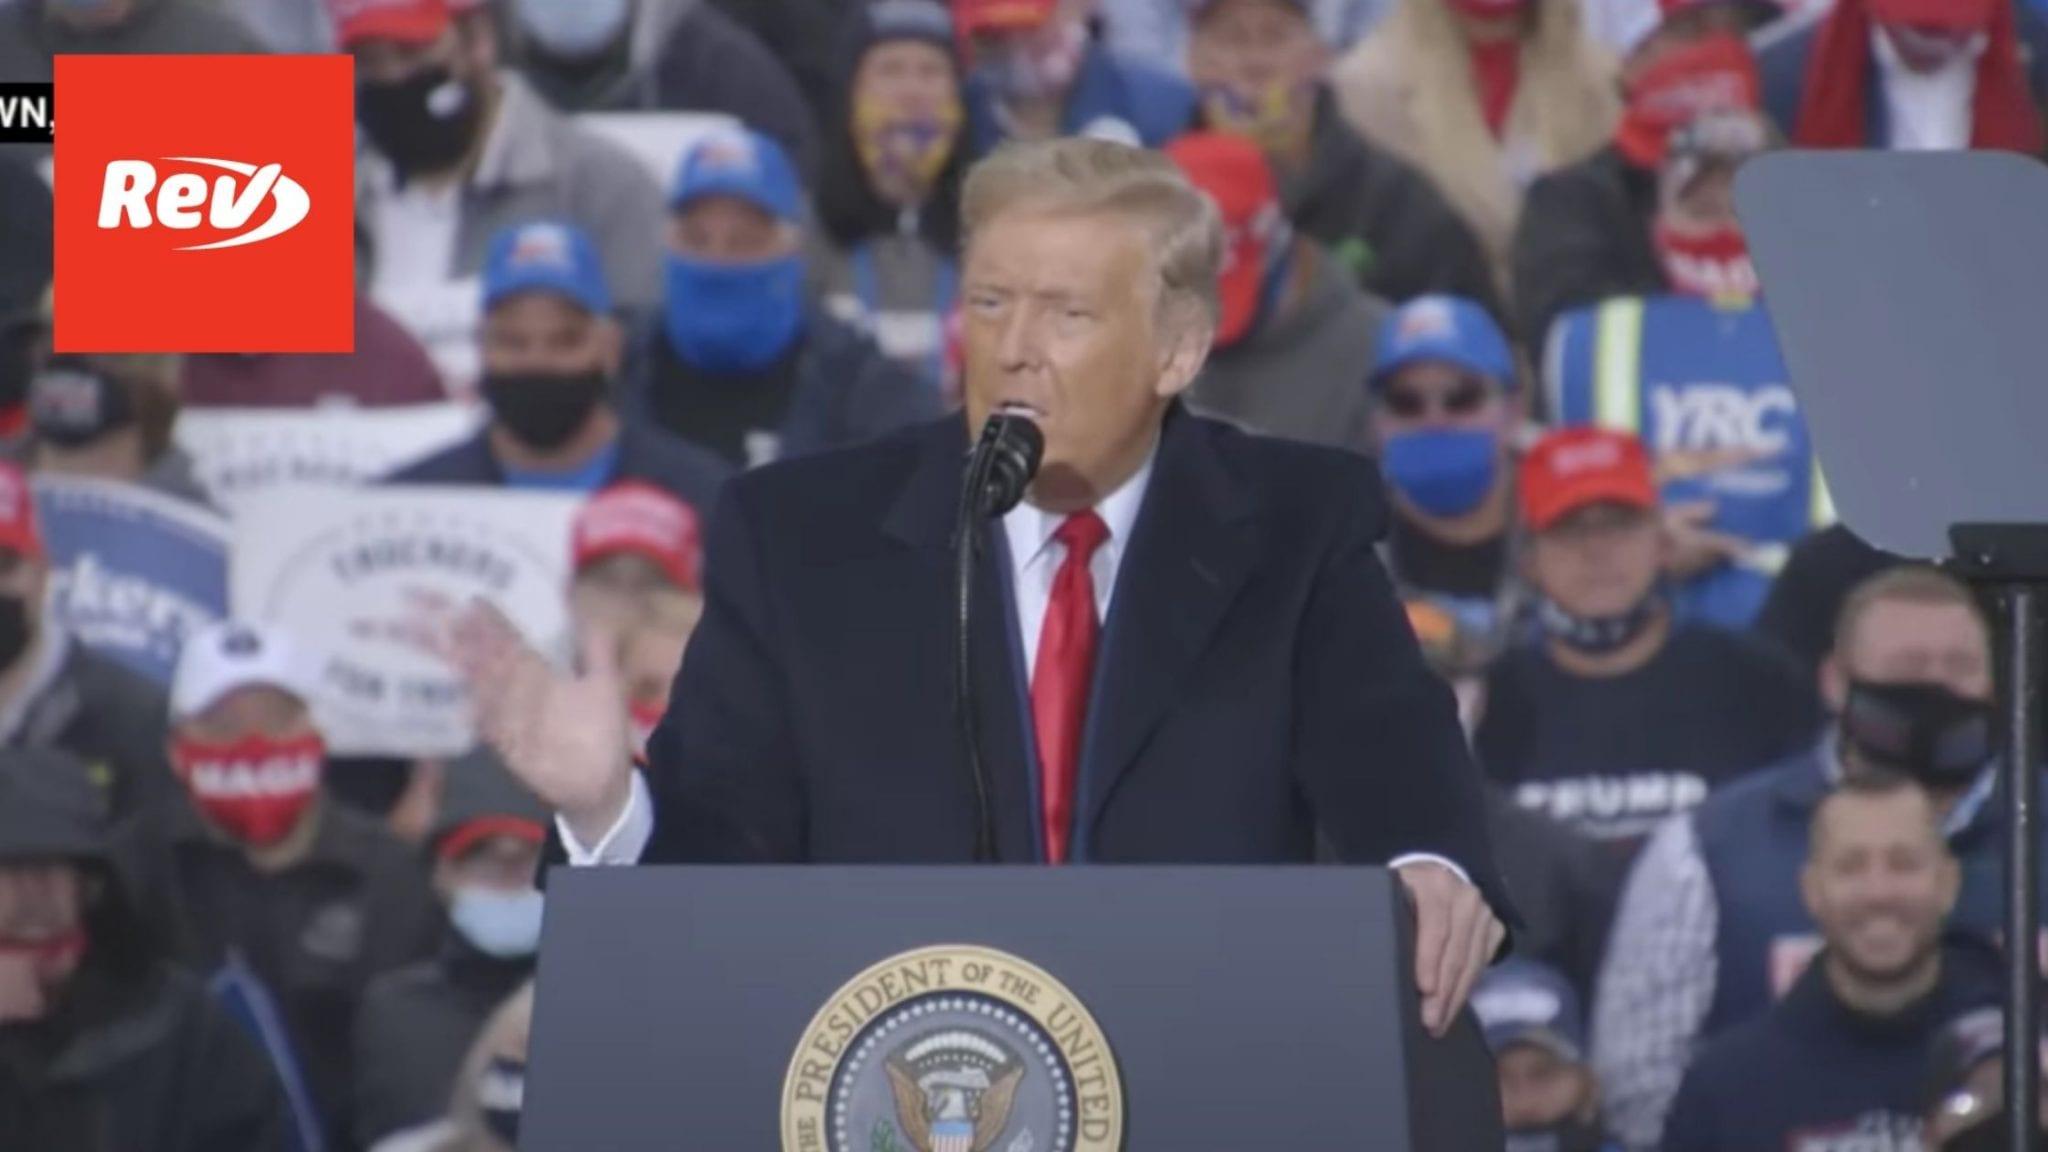 Donald Trump Rally Speech Transcript Allentown, PA October 26